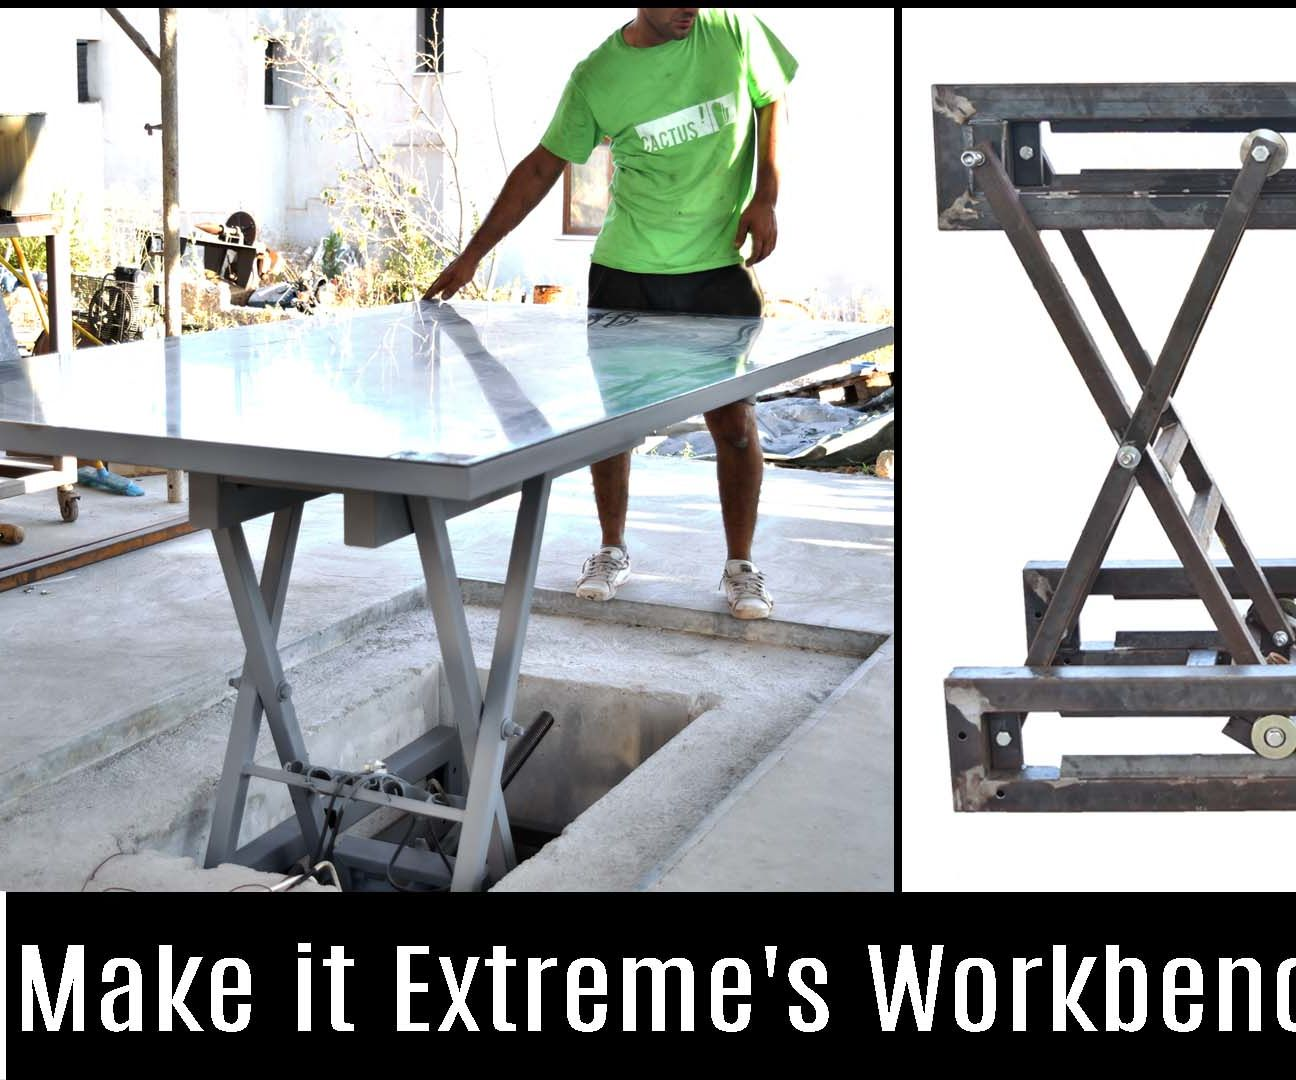 Make It Extreme's Workbench